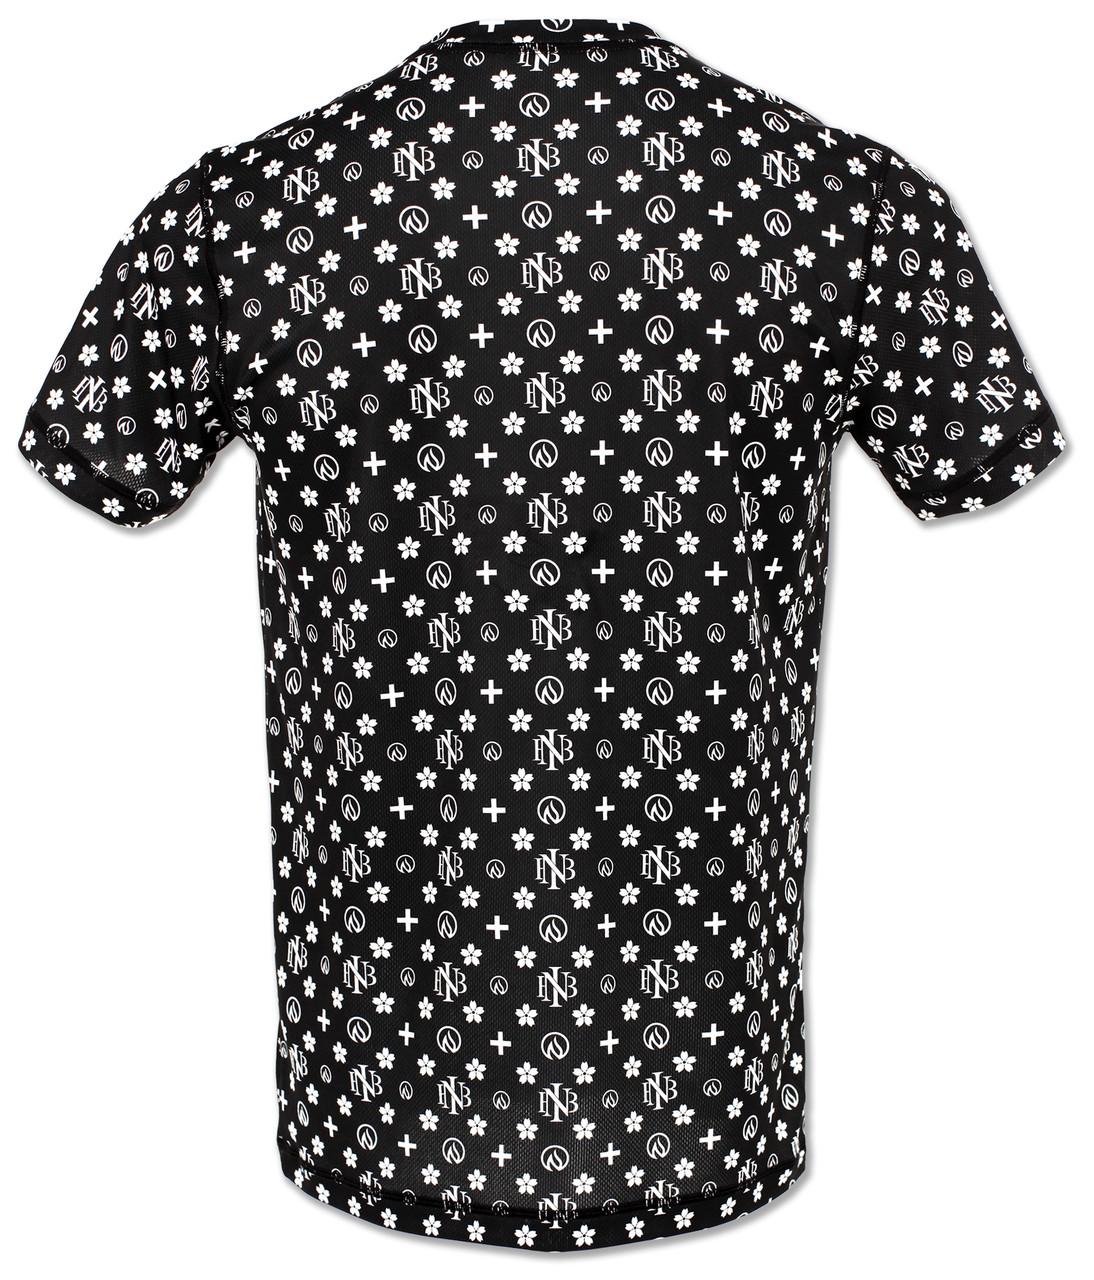 INKnBURN Men's Club INB Monogram Tech Shirt Back